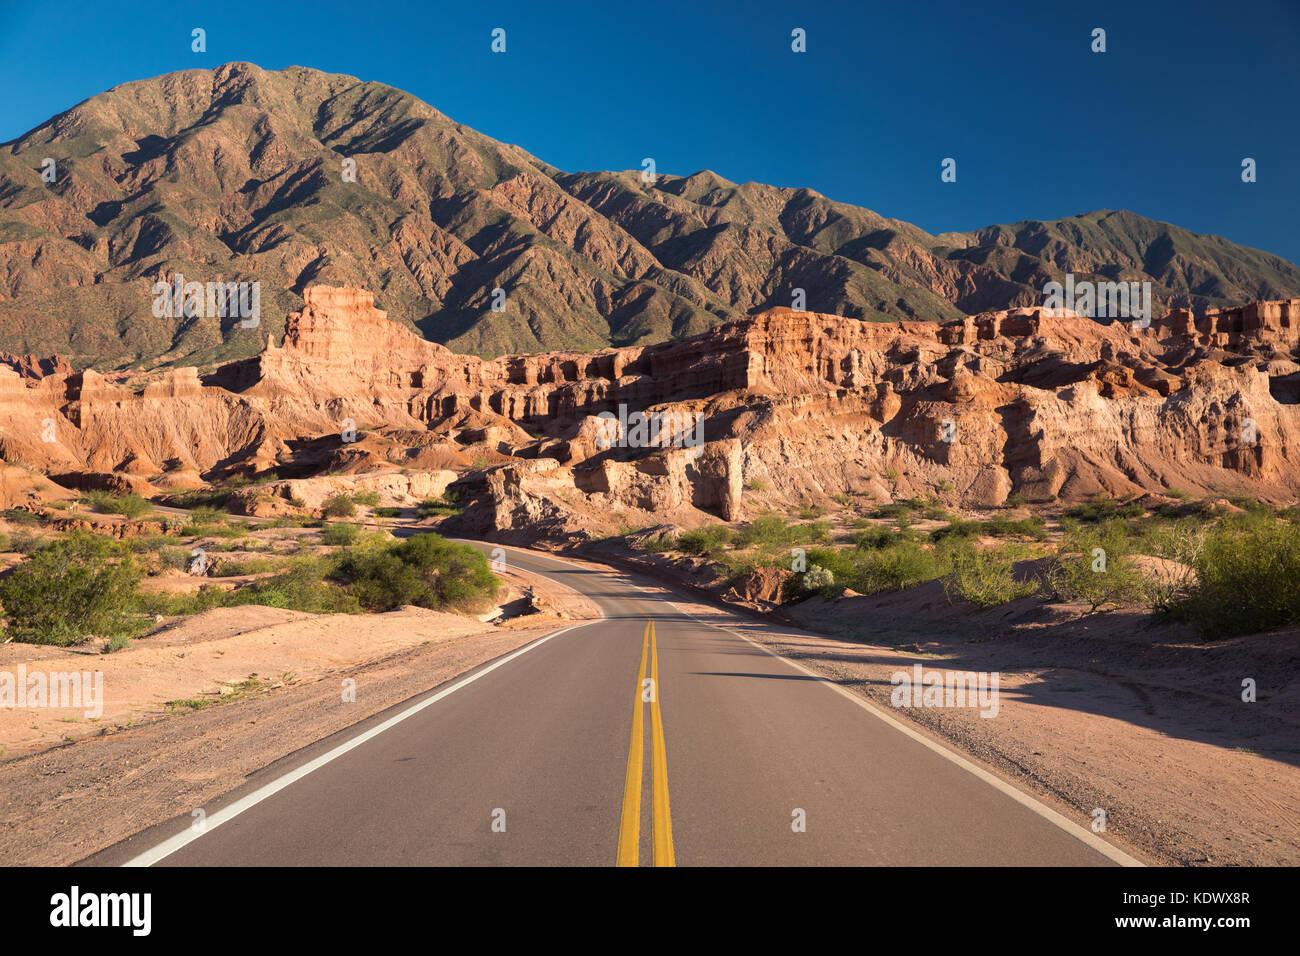 La route de la quebrada de la conches, valles calchaquies, la province de Salta, Argentine Banque D'Images